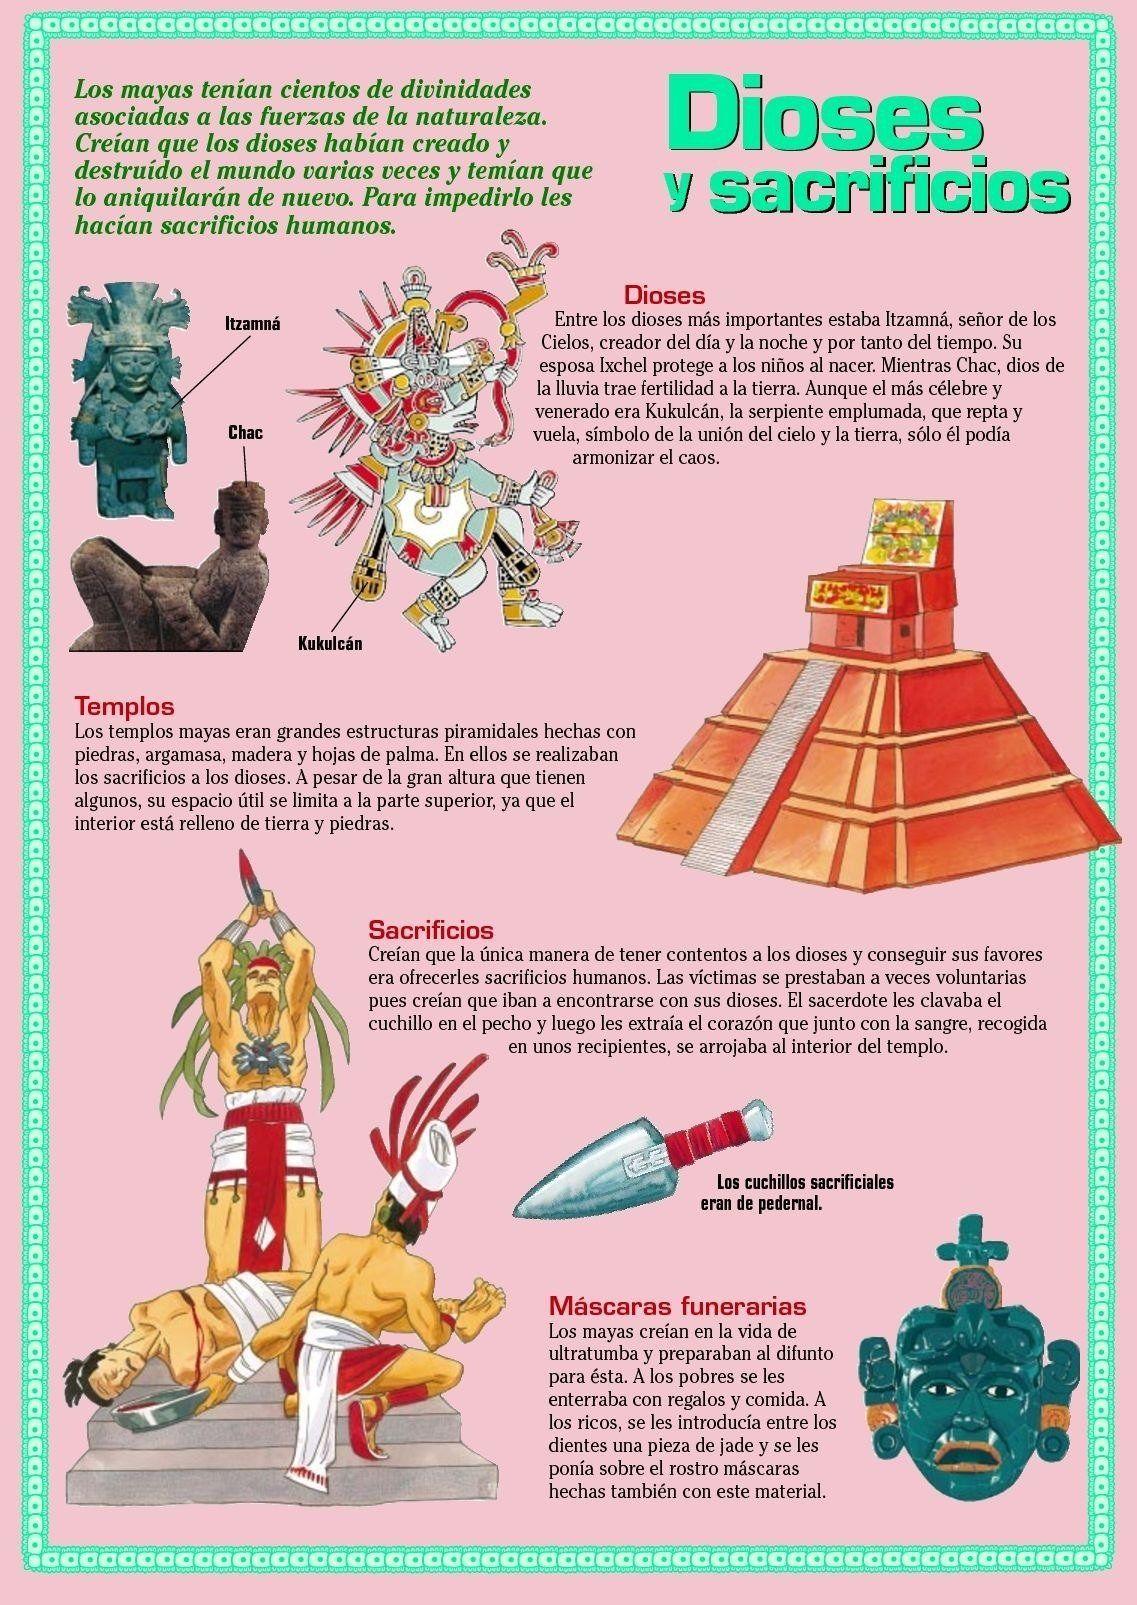 Lo Que Debes Saber De La Cultura Maya En 6 Infografias En Taringa Mexico History Spanish Teaching Resources Spanish Culture